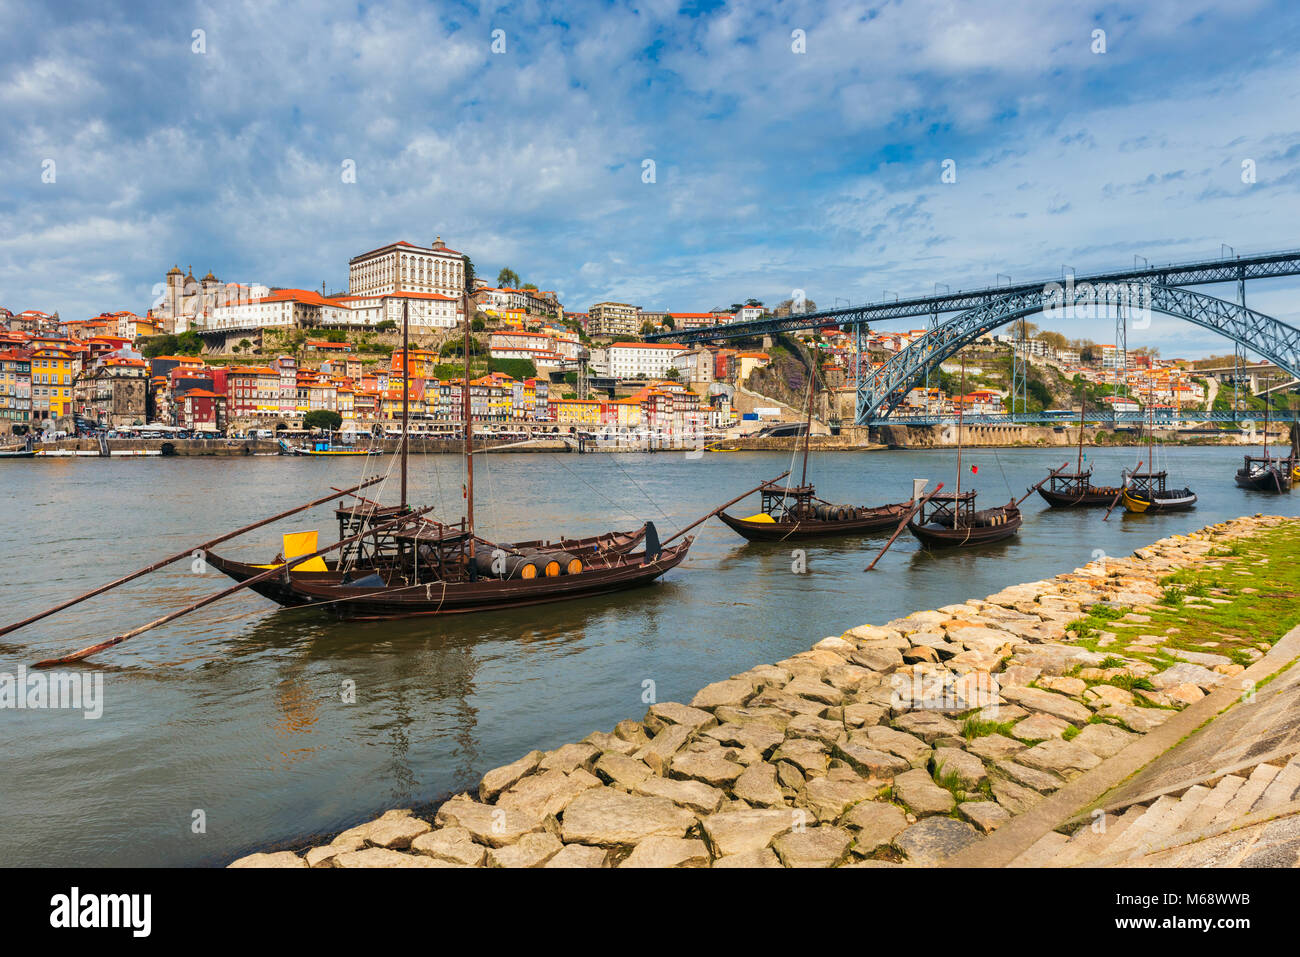 Rabelo Boats on the Douro River in Porto Portugal. Stock Photo